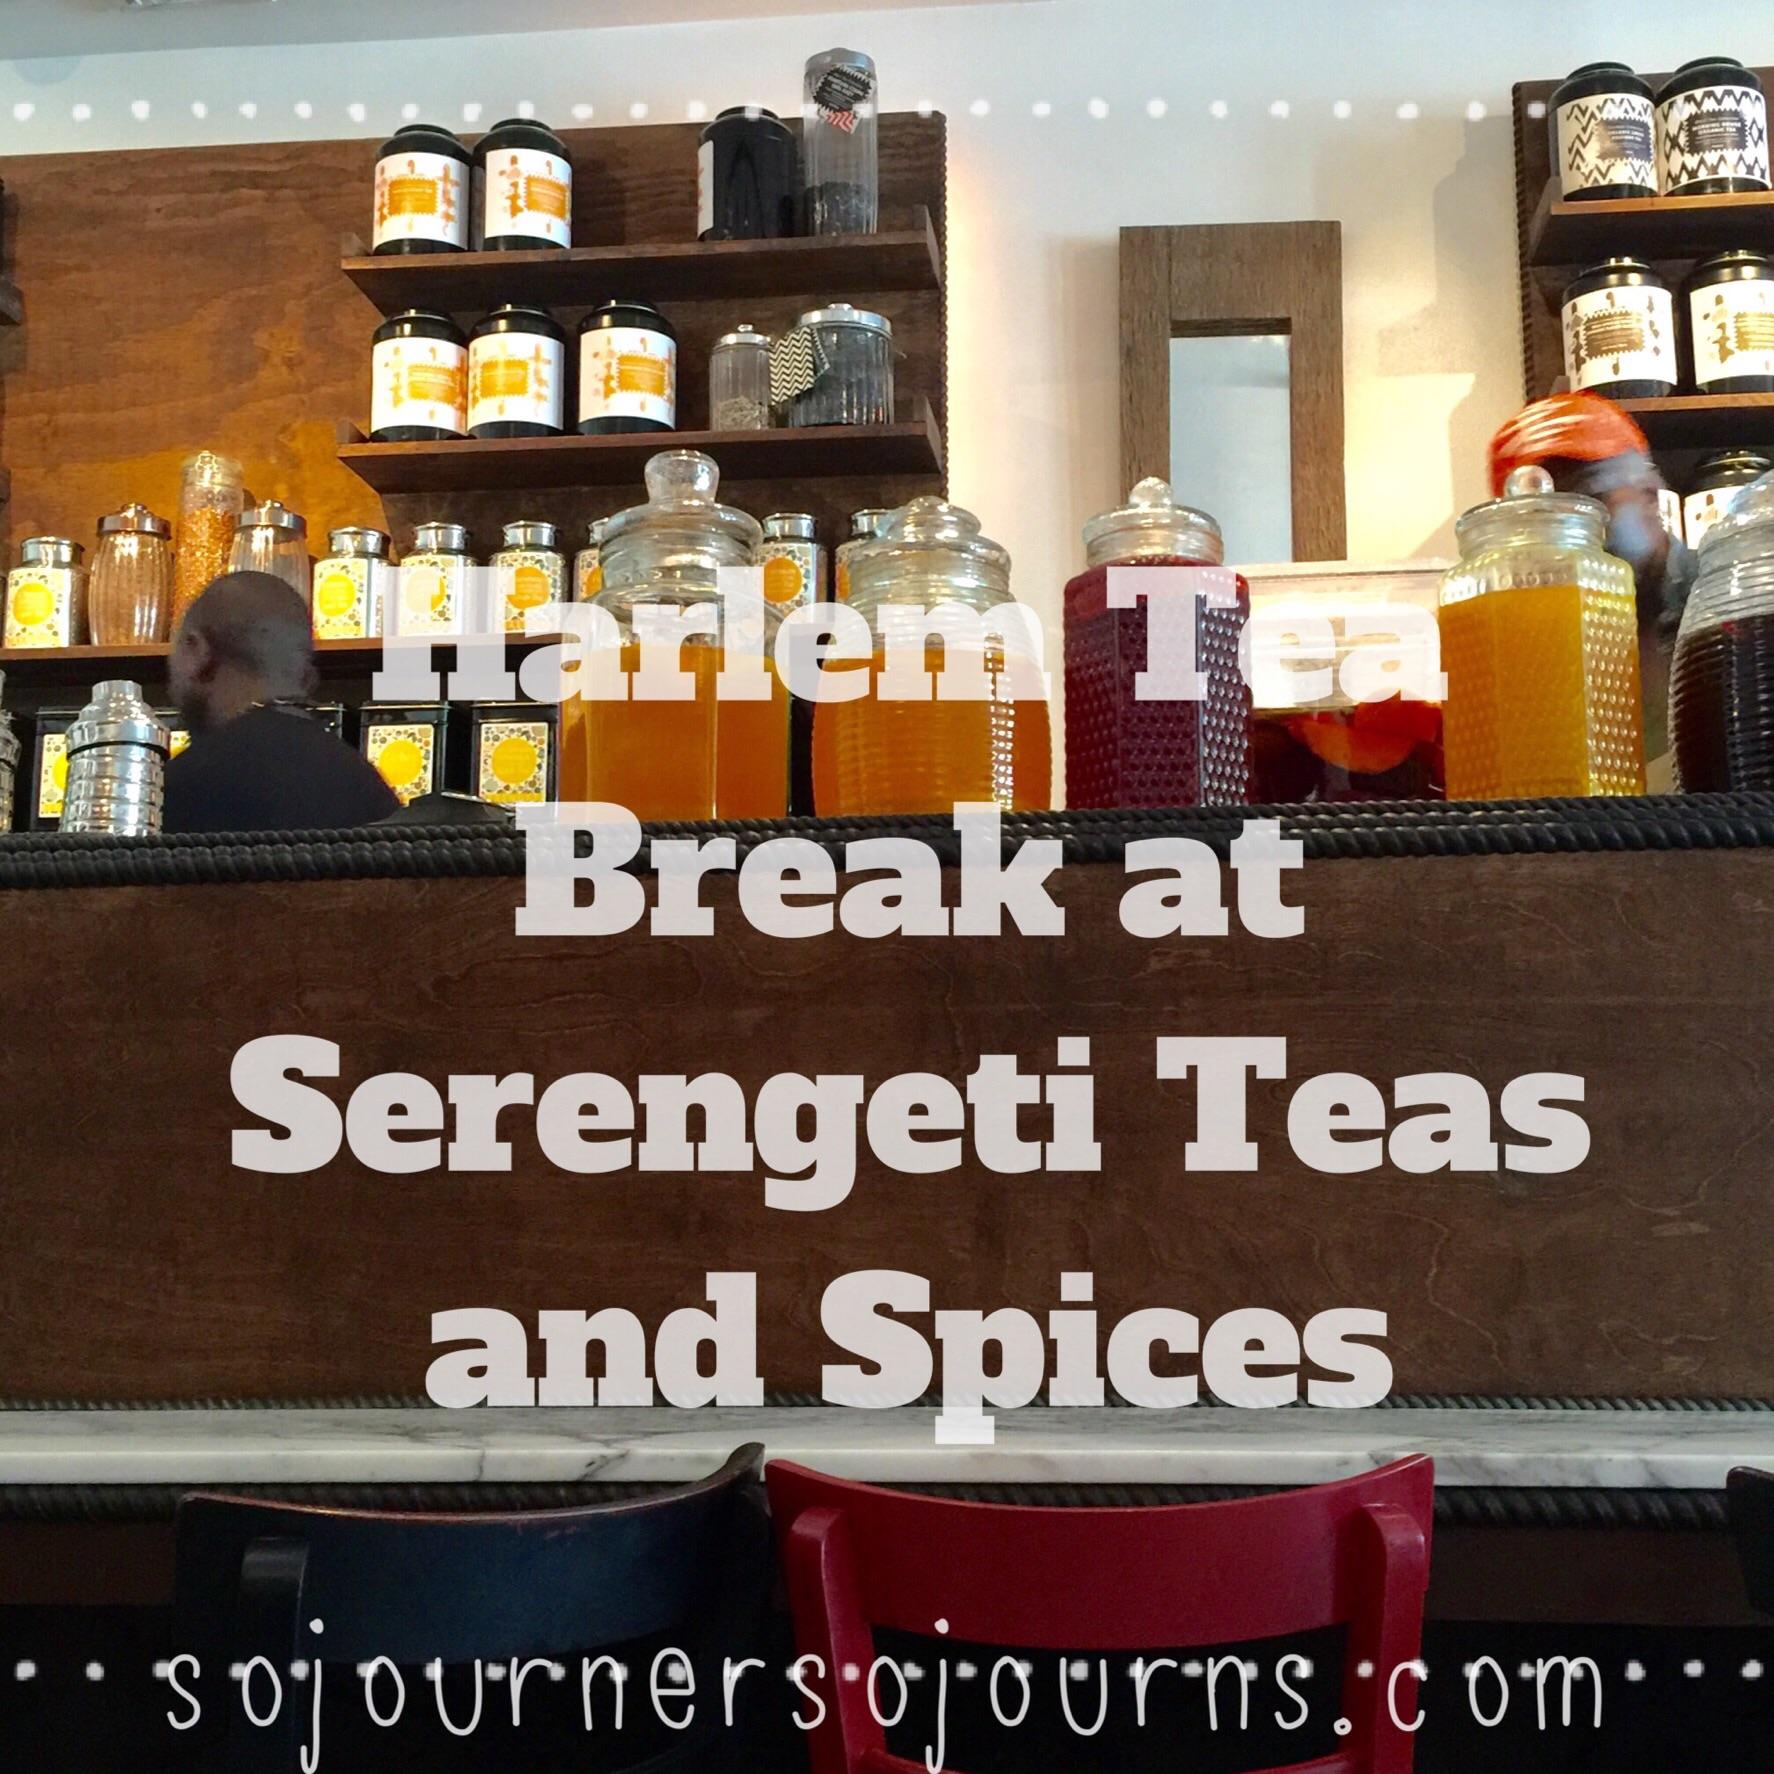 Harlem Tea Break At Serengeti Teas And Spices Sojourner